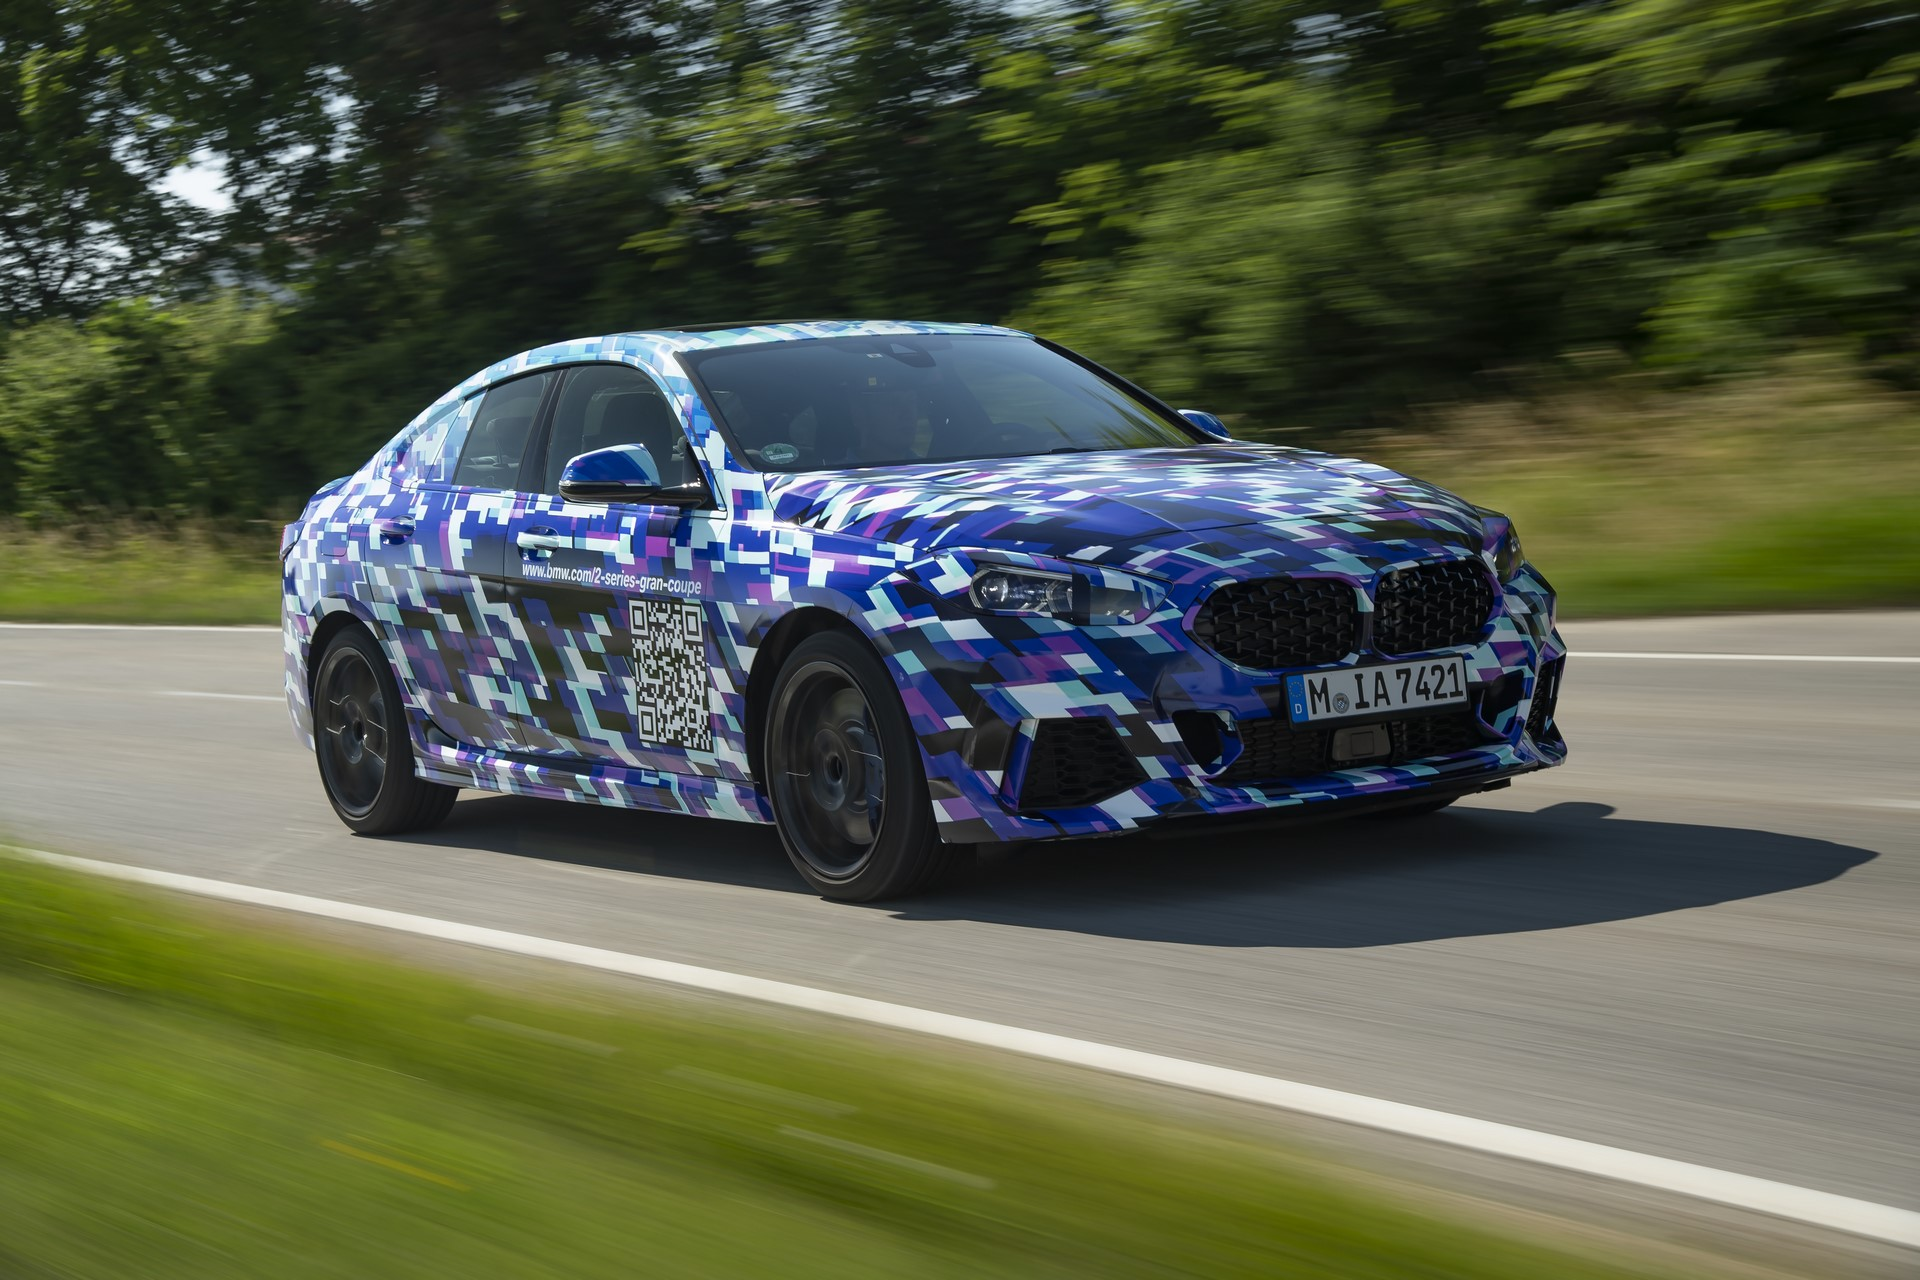 BMW-2-Series-Gran-Coupe-2020-spy-photos-27